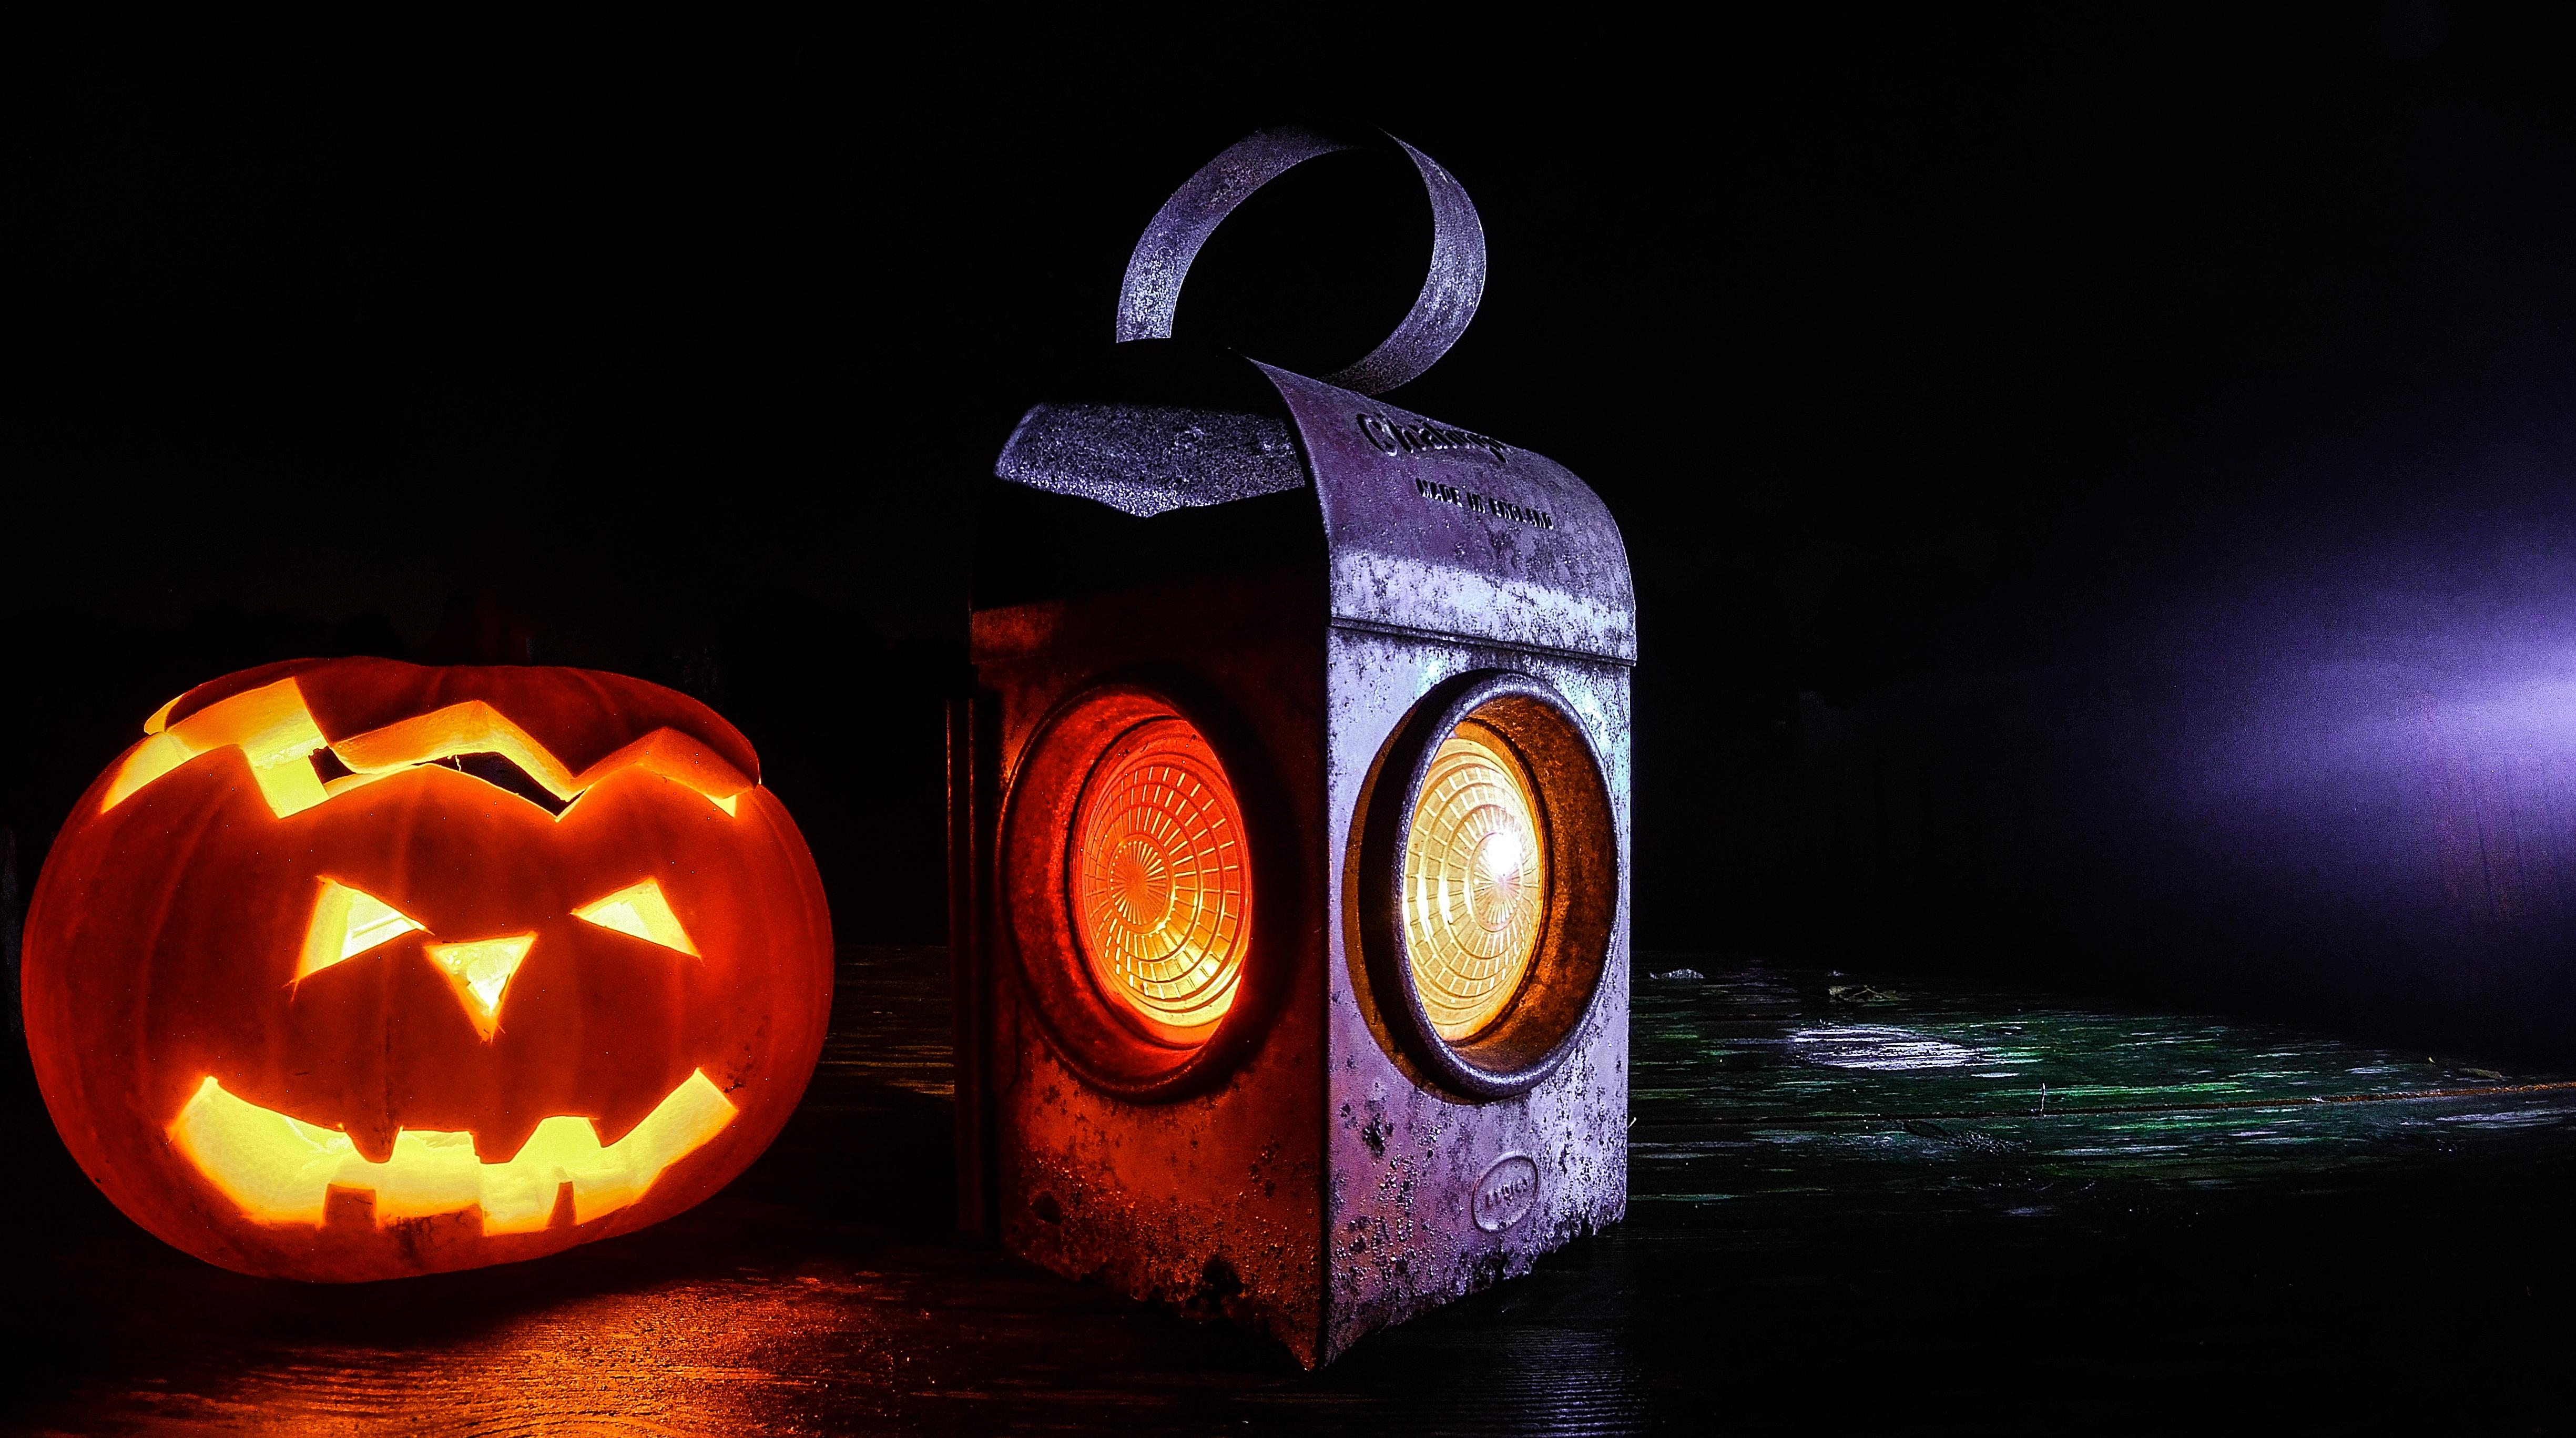 Kapoosh Halloween image